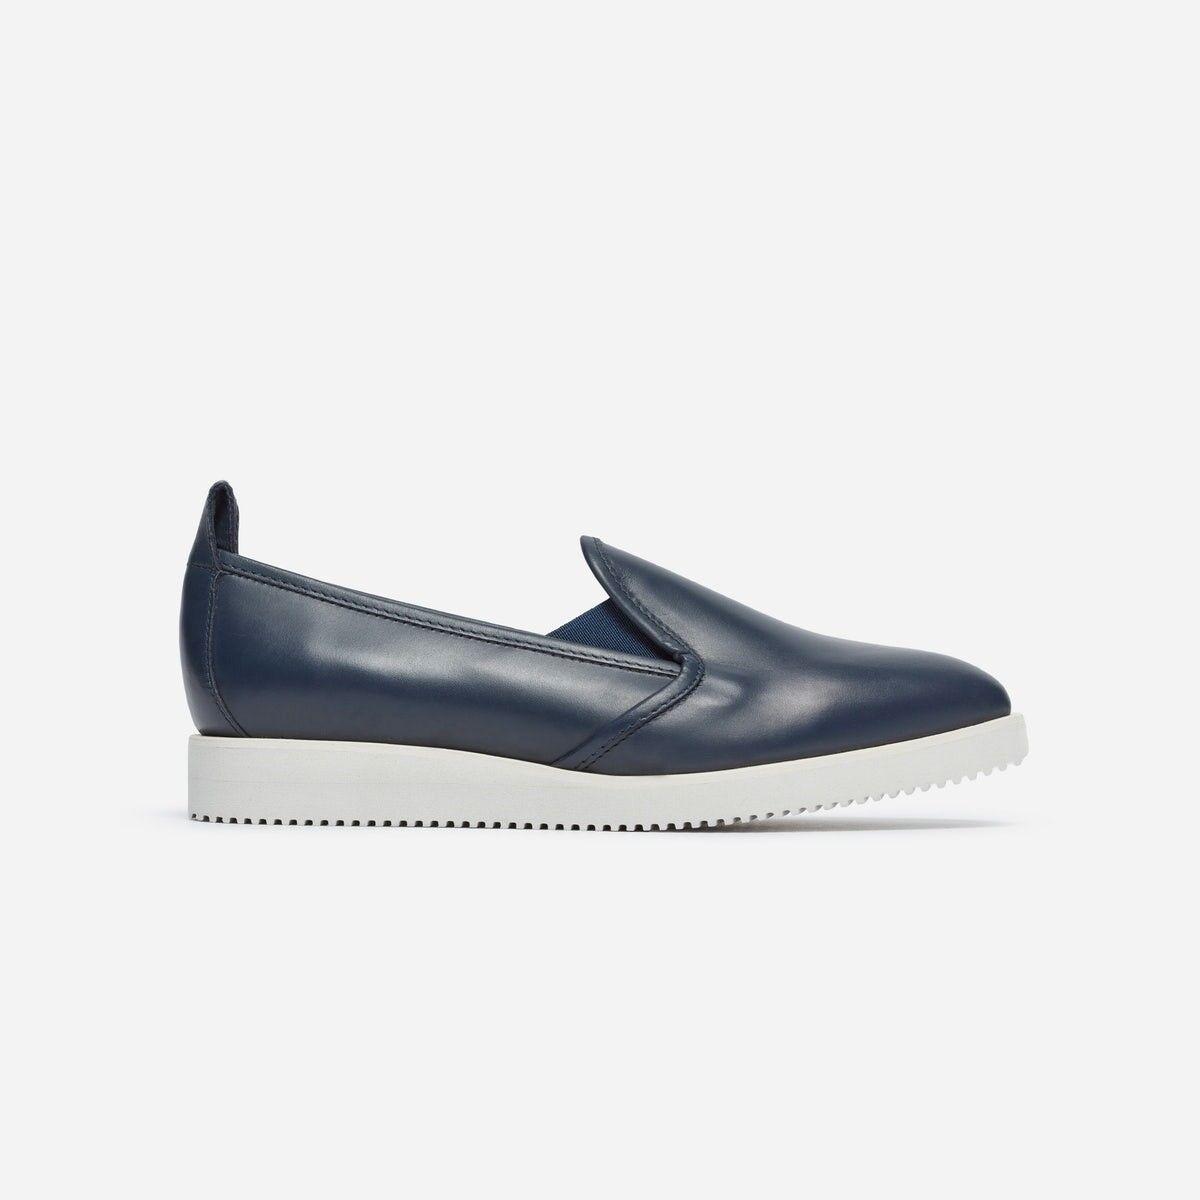 Everlane The Pelle Street Shoe Taglia 5 - Navy (brand new)